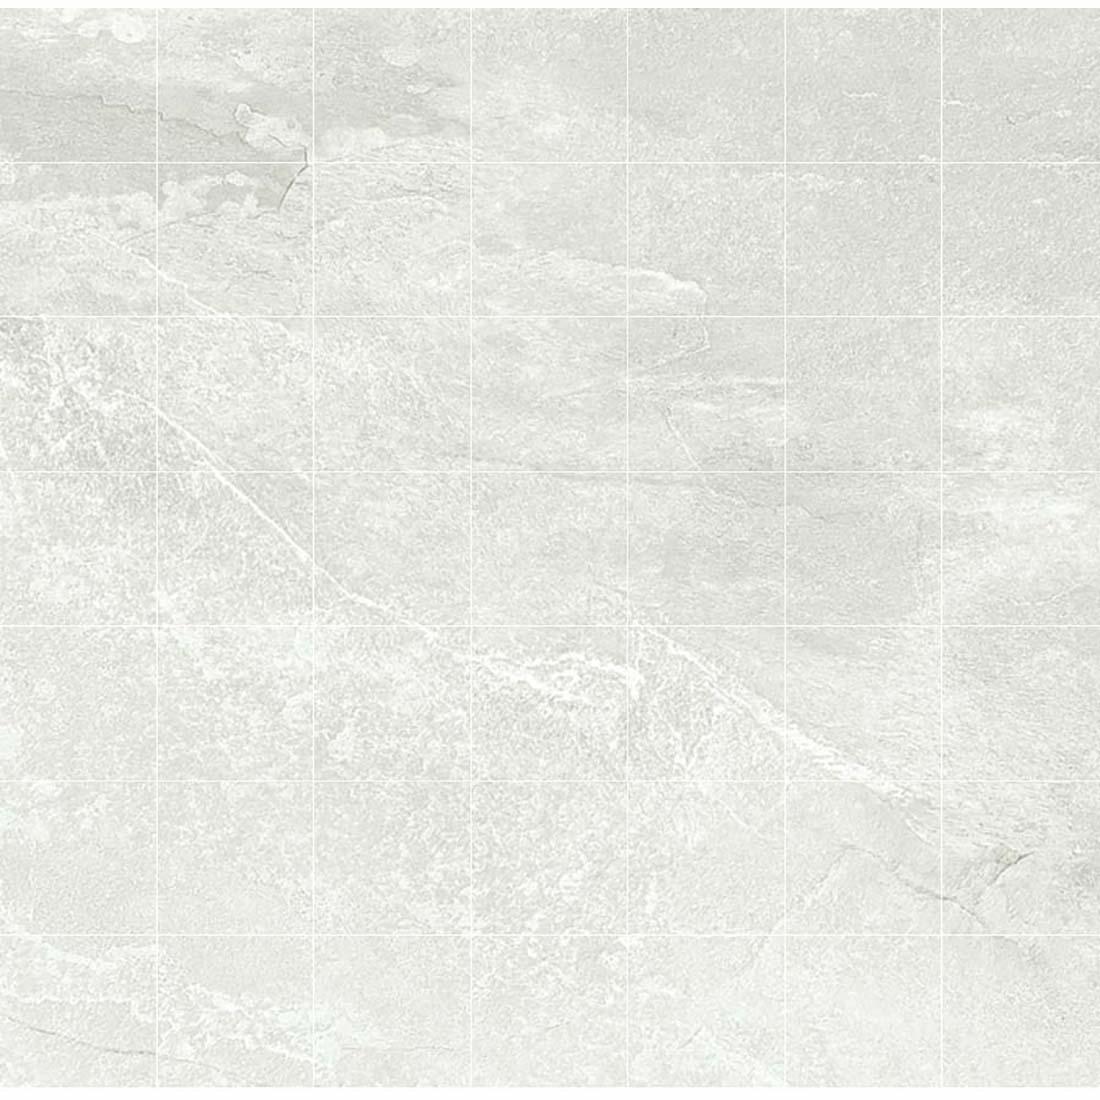 Delta Mosaic 33x33 Beige Matt 1